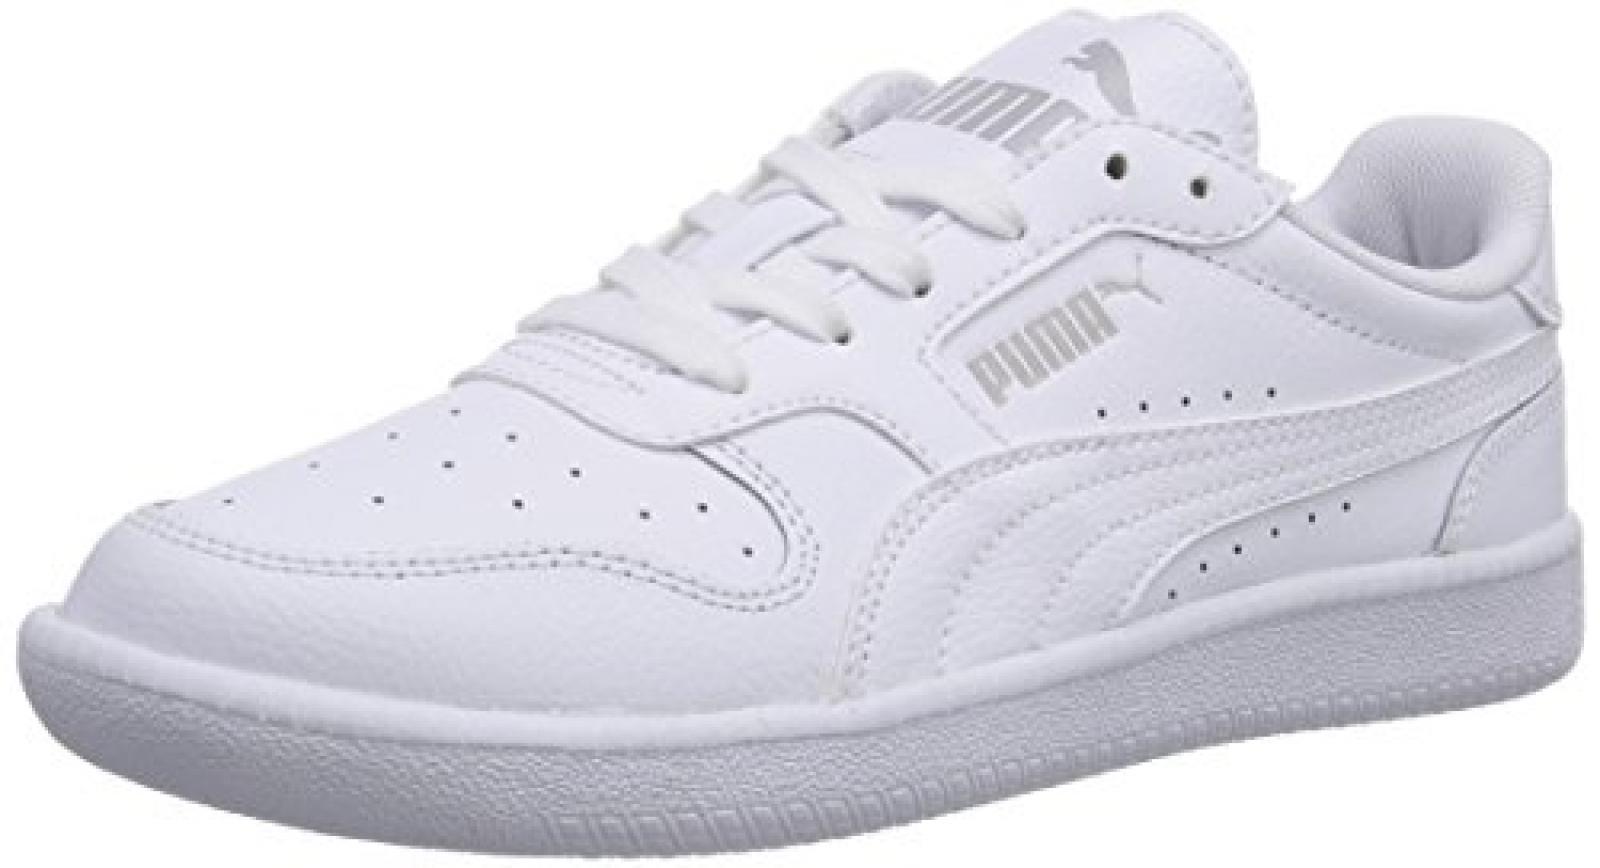 Puma Icra Unisex-Kinder Sneakers